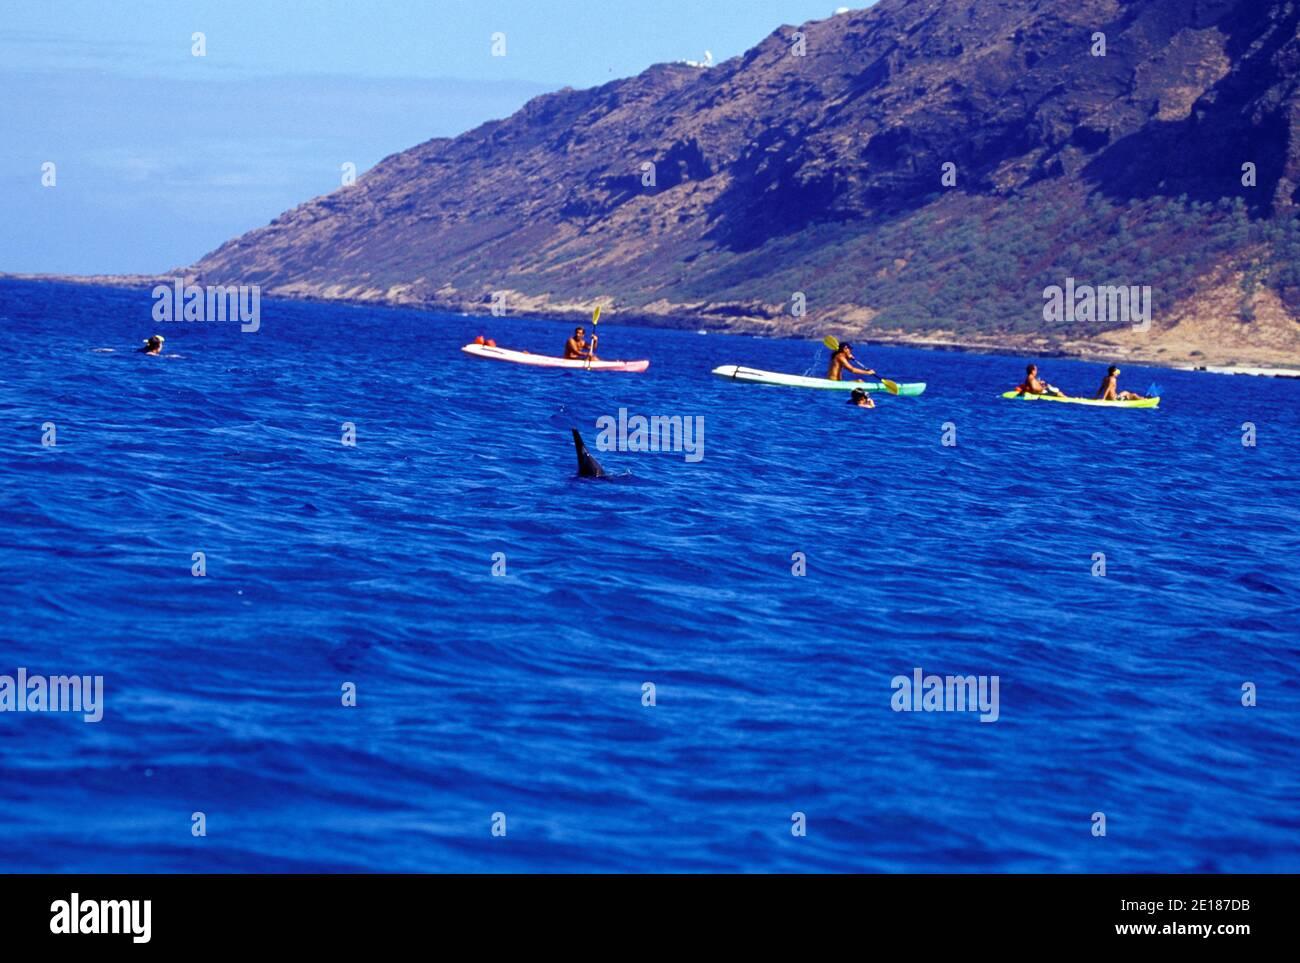 People dolphin watching by boat and kayak off Makua beach, Oahu, Hawaii Foto de stock